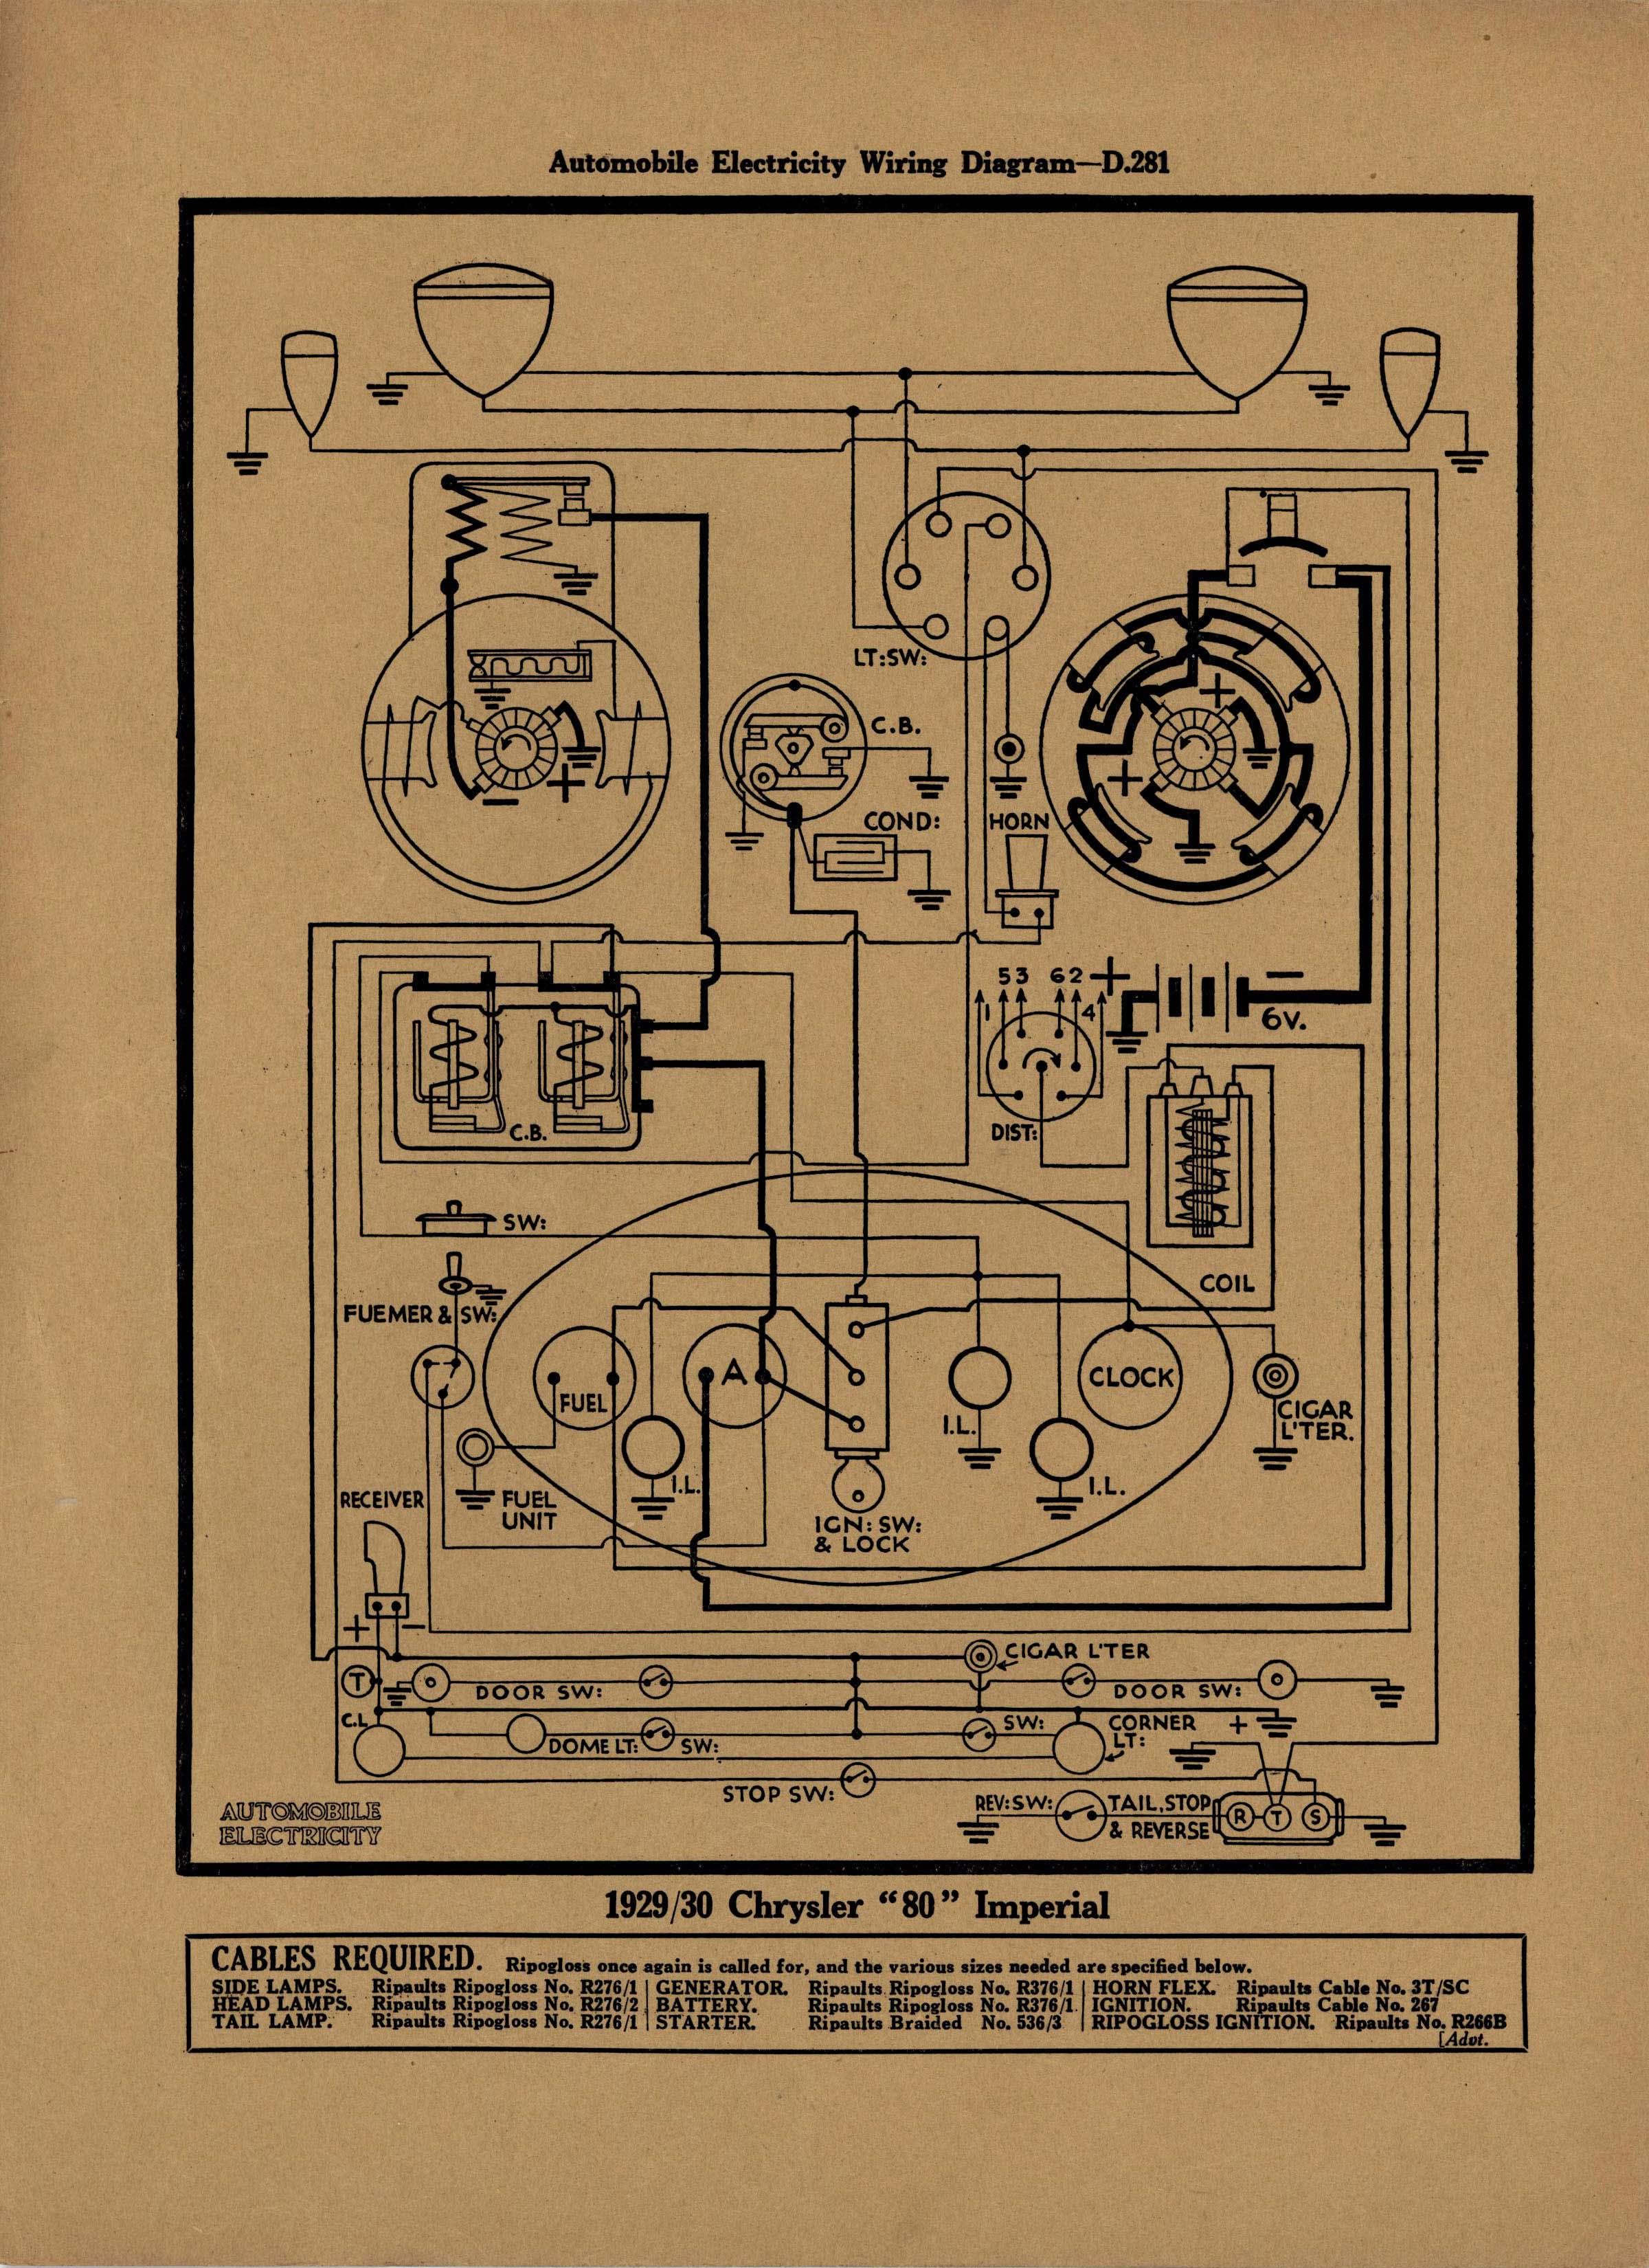 1951 Imperial Wiring Diagram 59 Les Paul Wiring Diagram Cusshman Ati Bege Jeanjaures37 Fr